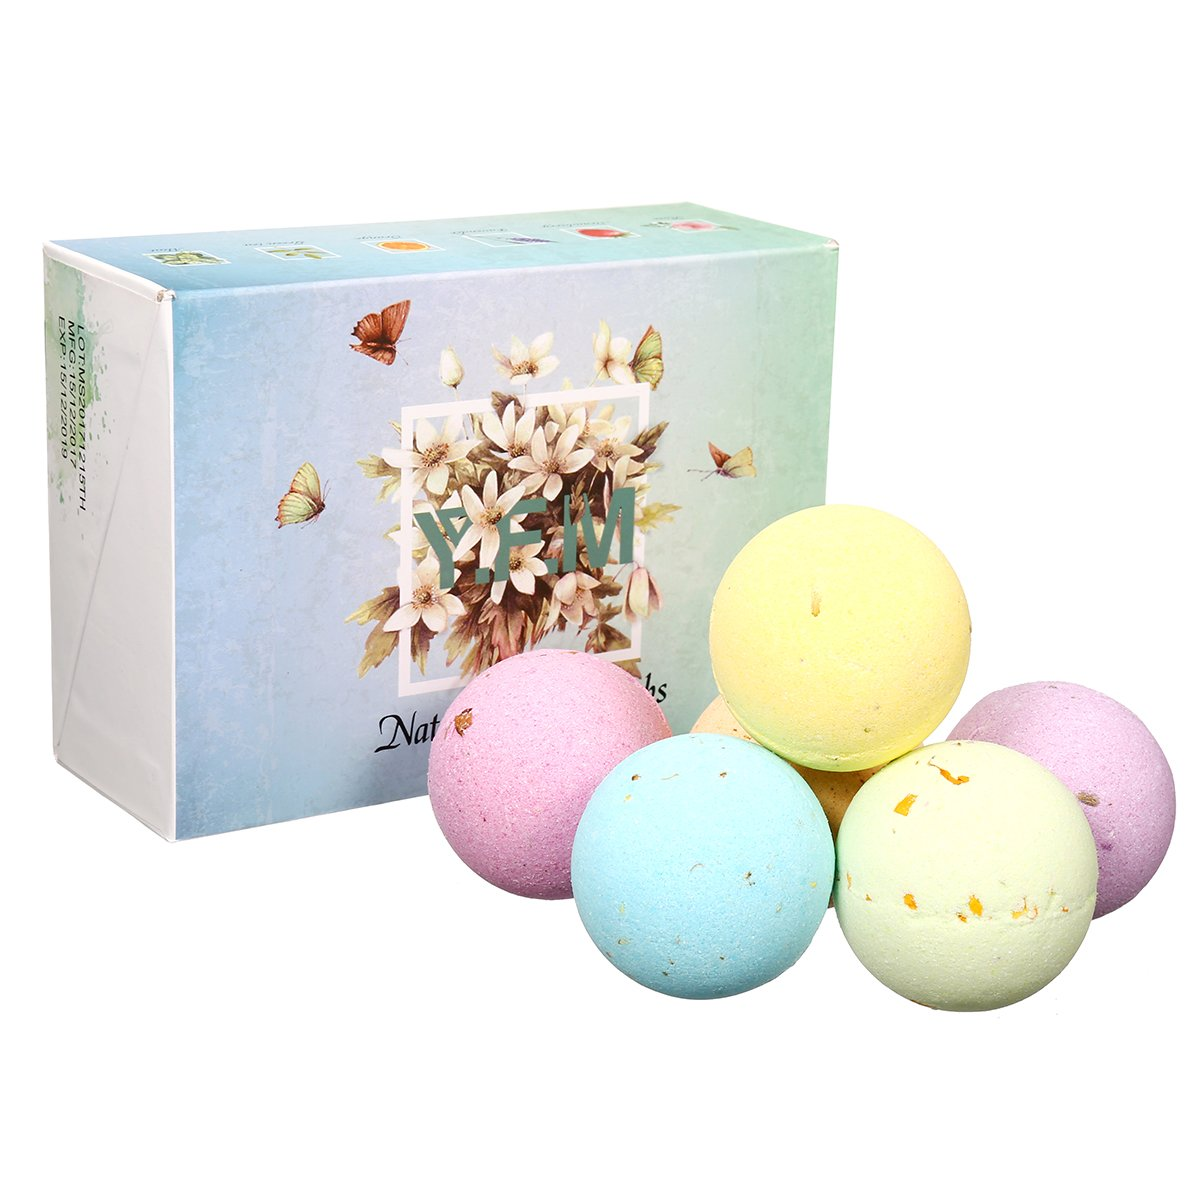 Bath Bomb Gift Set, Y.F.M. 6 Pcs x 60g Handmade Spa Fizzing Mild Natural Essential Oils Bath Sets, Moisturizing Dry Skin Relaxation, Best Christmas/New Year Gift for Women/Men/Children